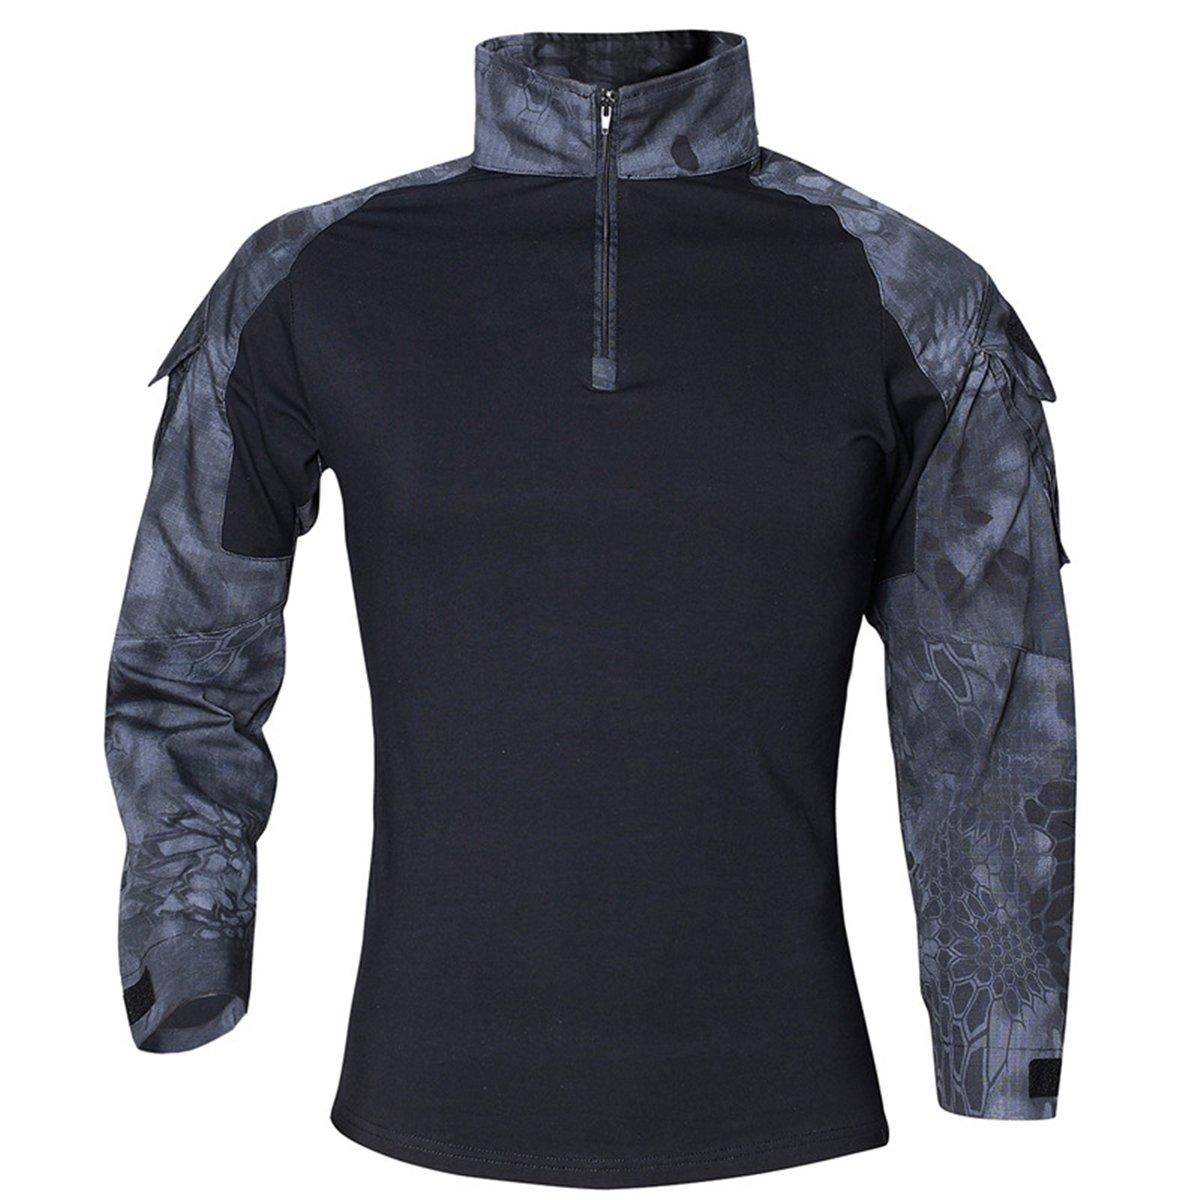 QCHENG Men's Tactical Airsoft Shirt Military Tactical BDU Combat T-Shirt Assault Long Sleeve Slim Fit Outdoor Army Multicam (Black Python X-Small)